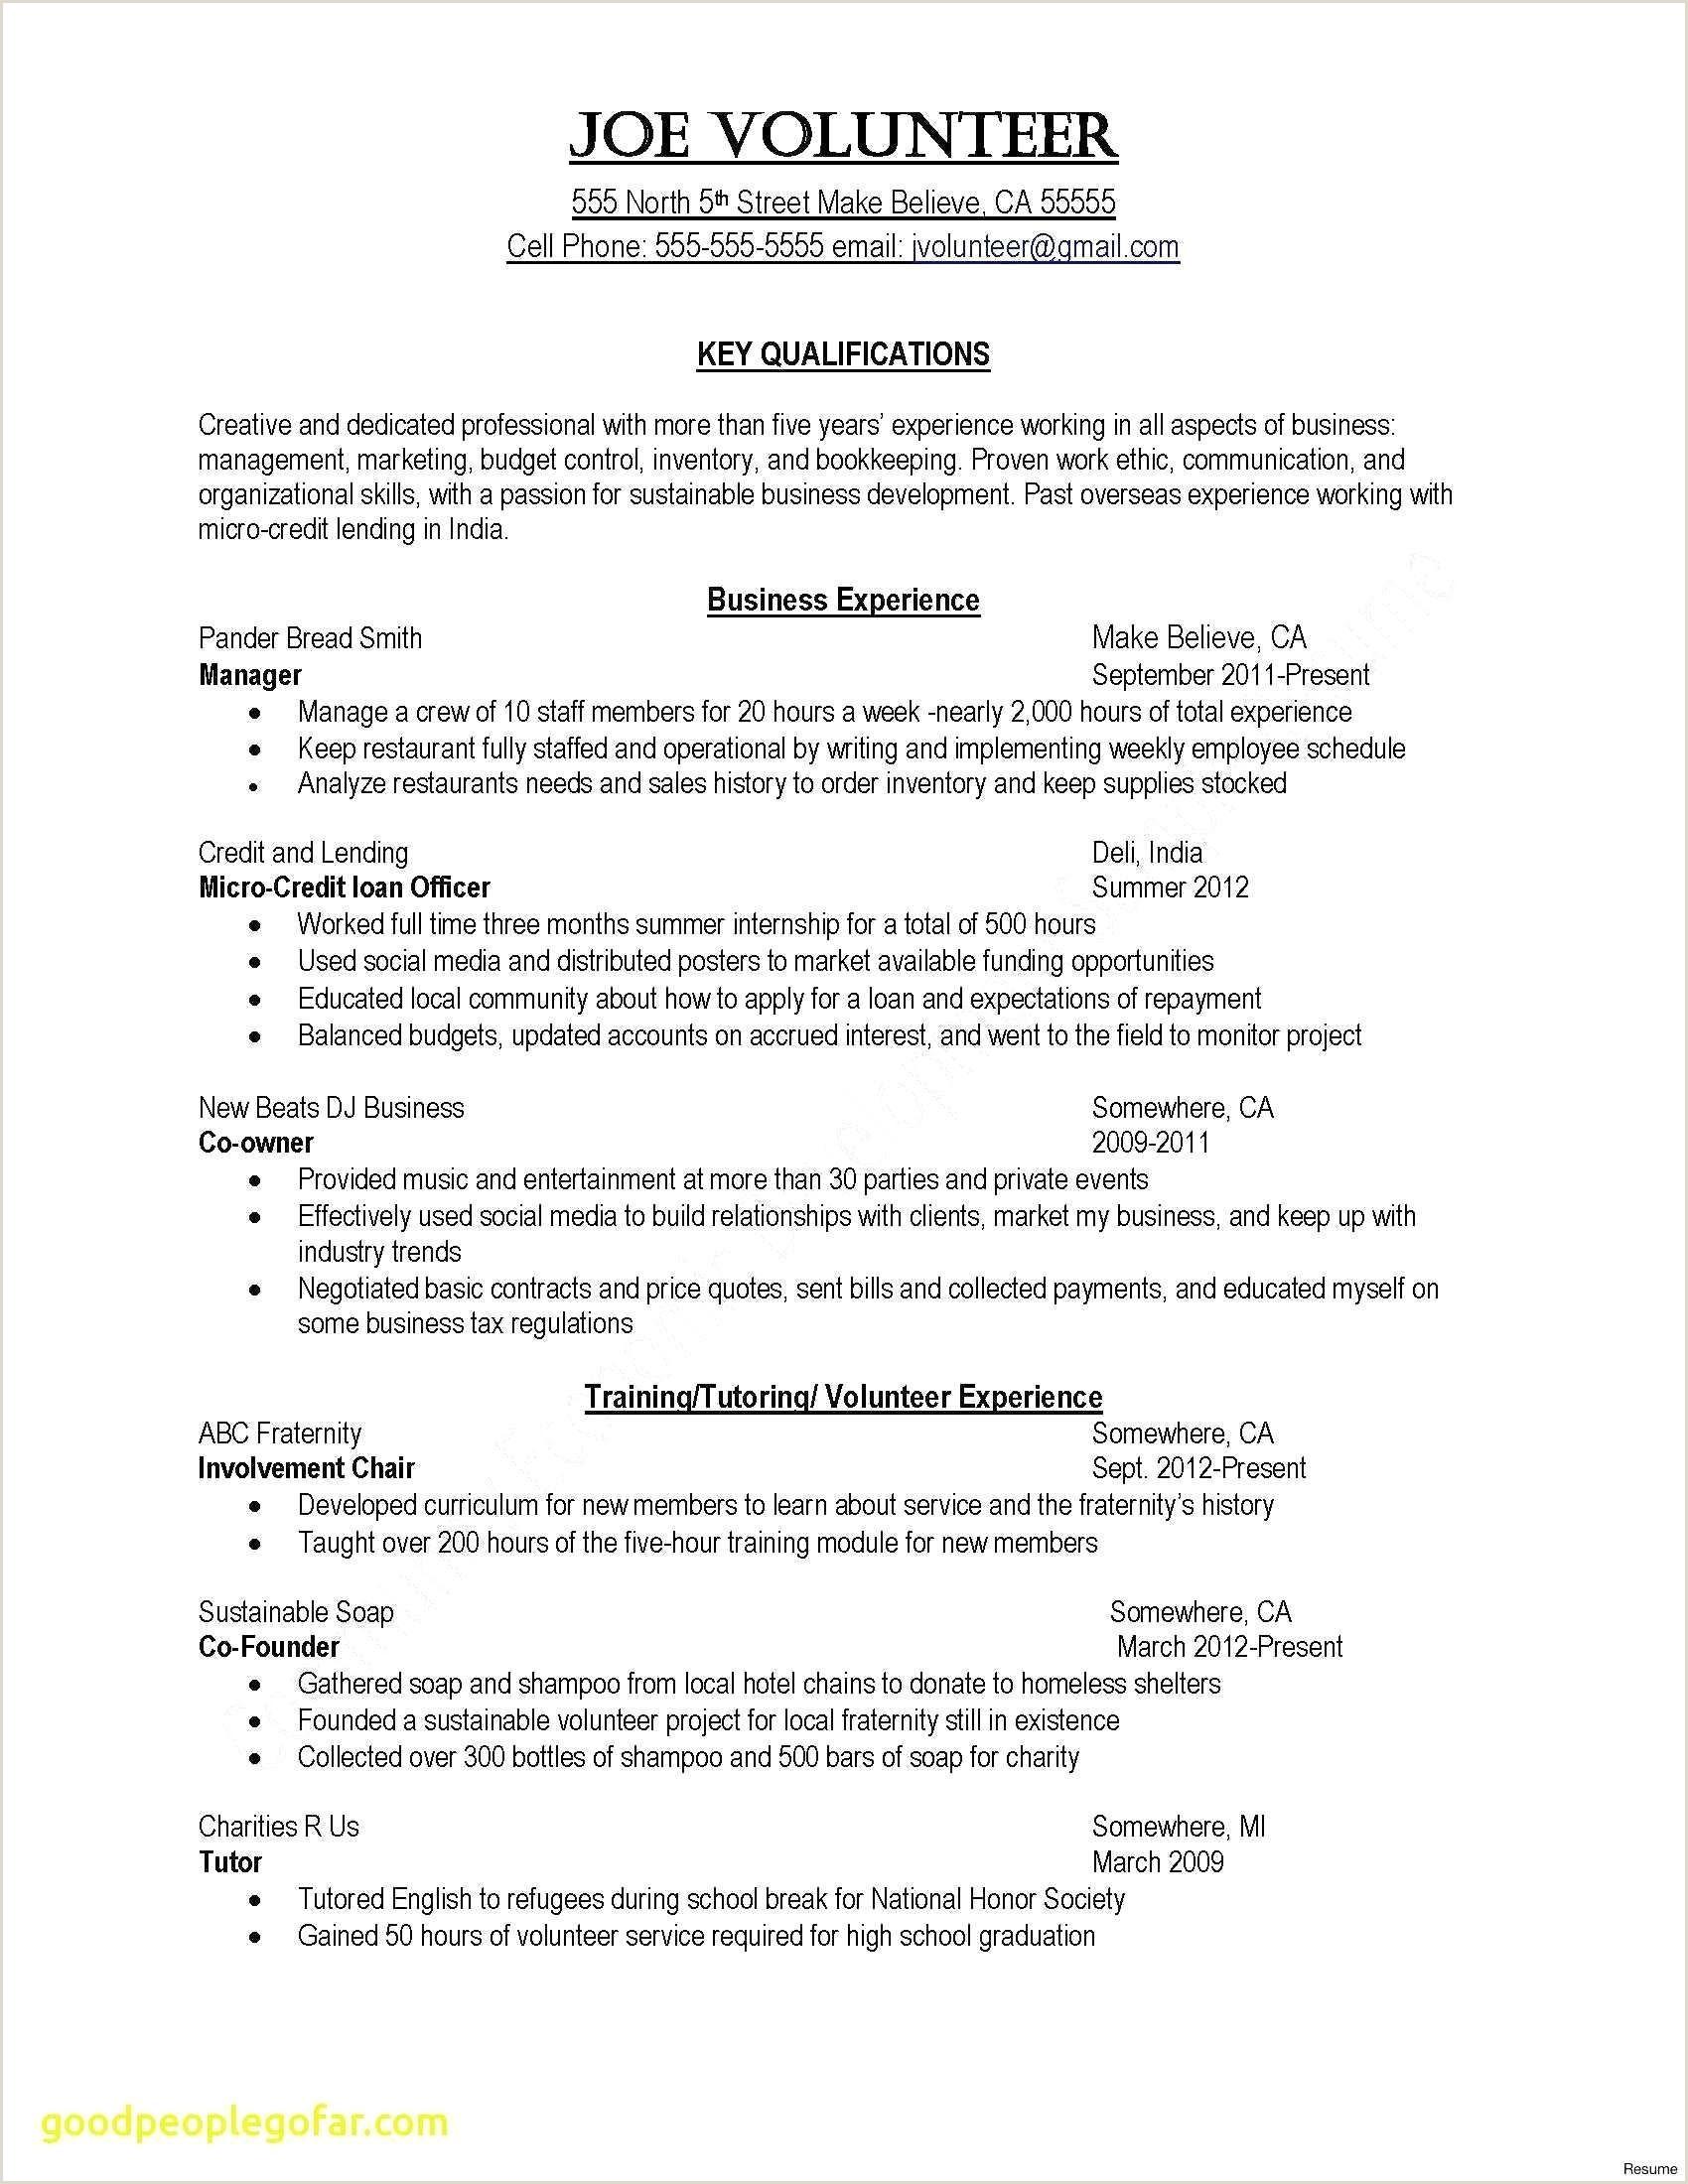 Corporate Officer Resignation Letter 12 How to Write Resignation Letter Samples